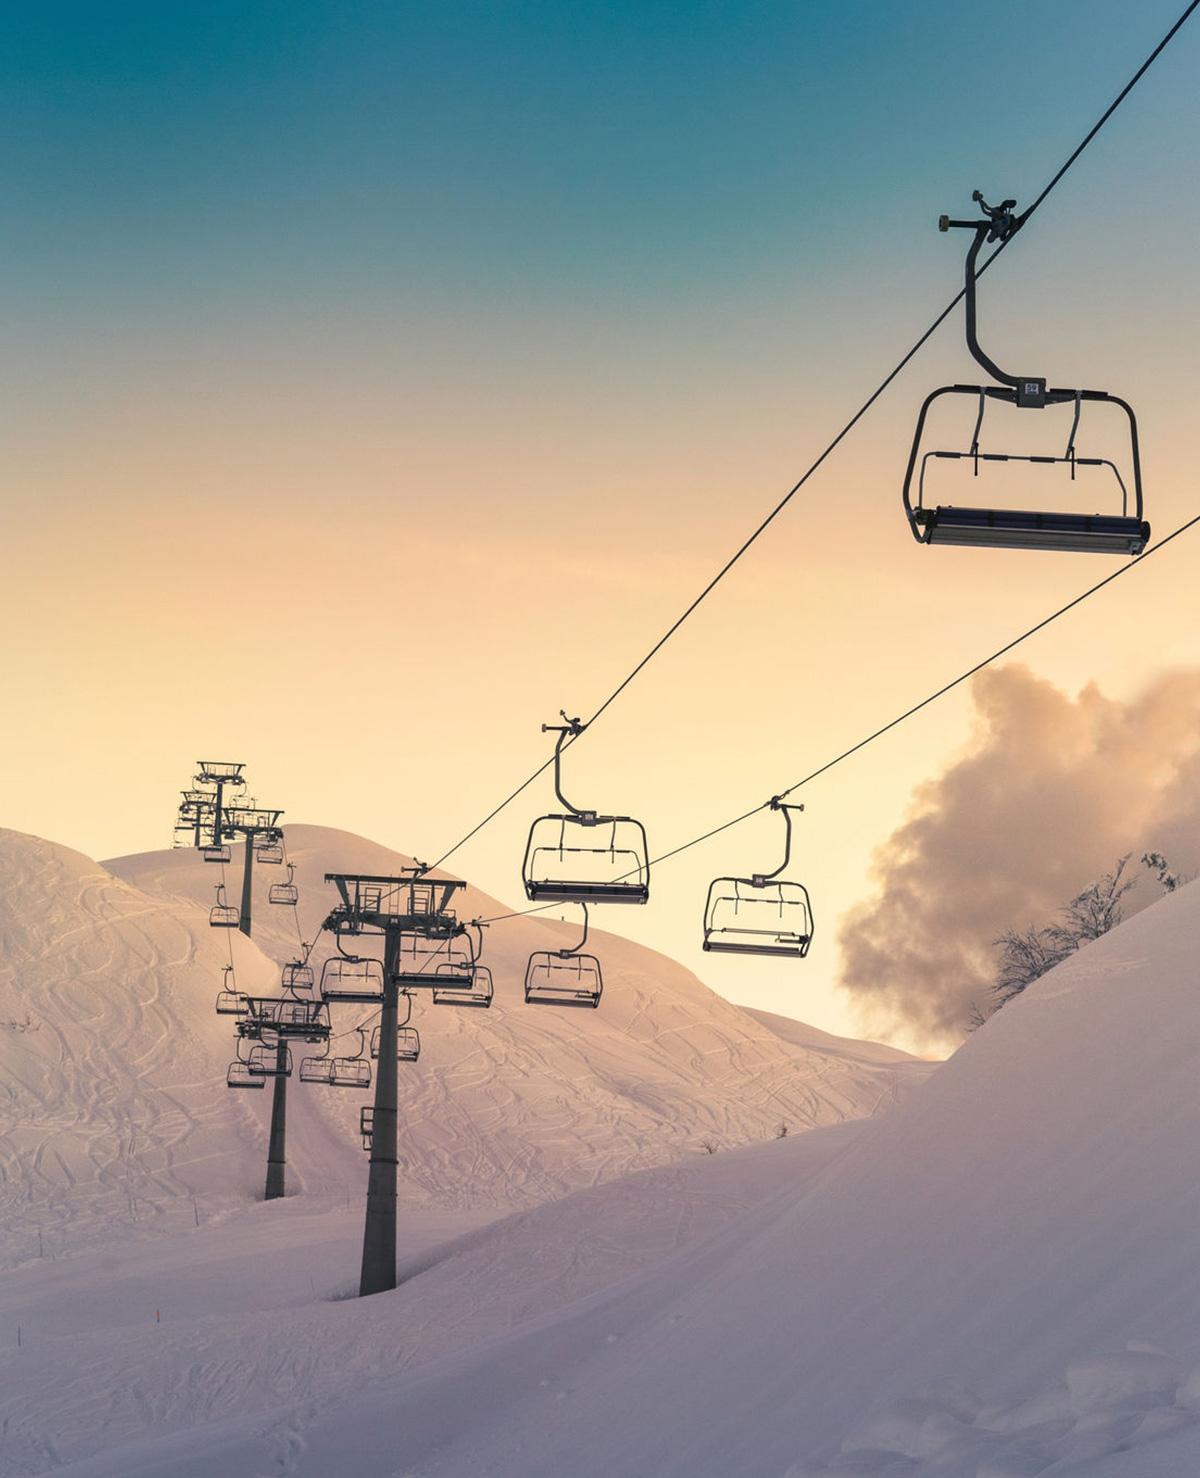 De leukste (en verrassendste) wintersport-apps